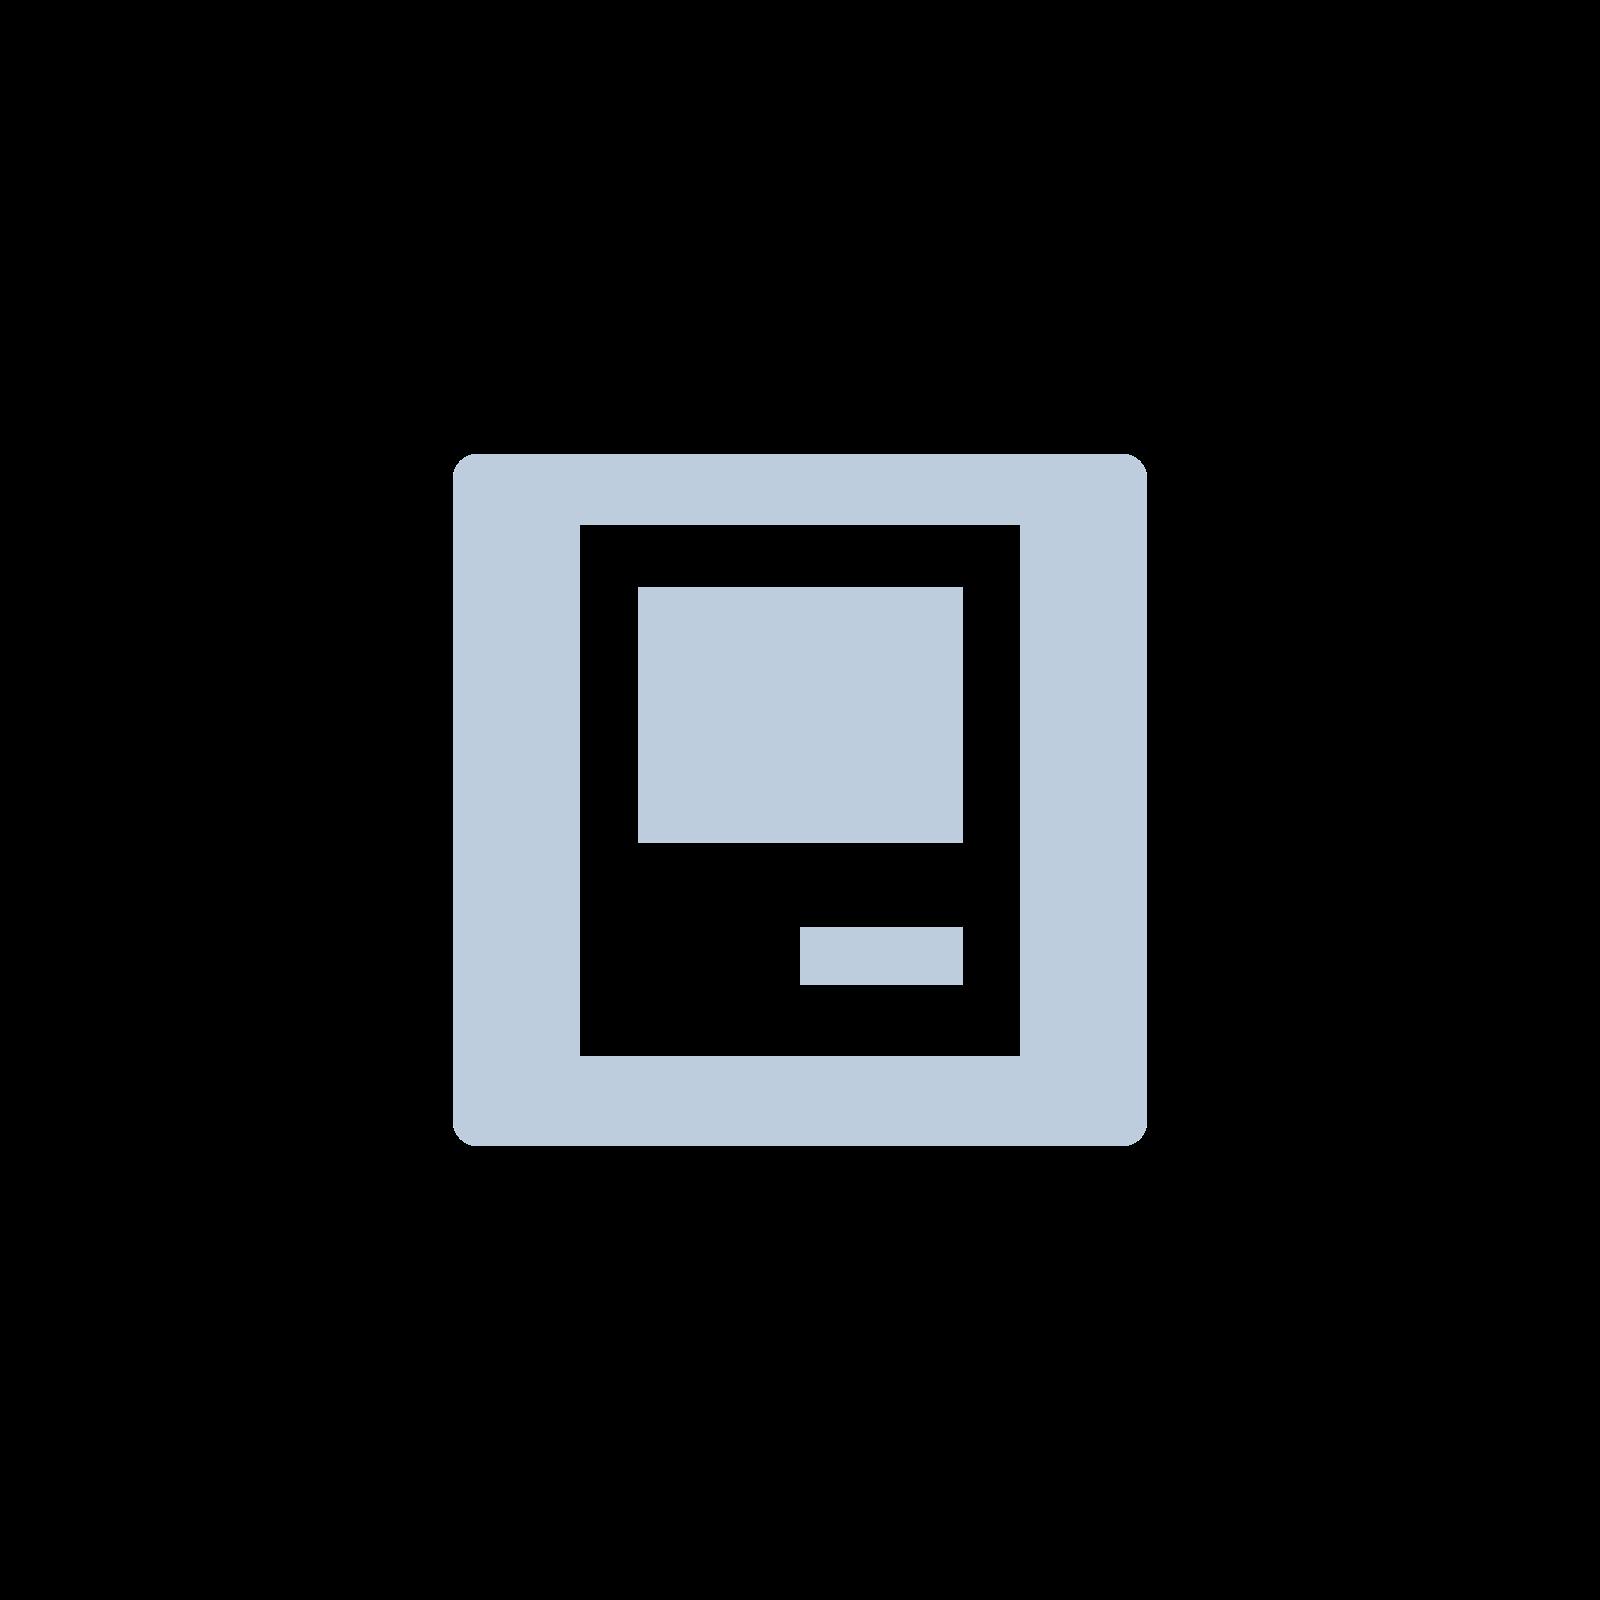 Mac mini Core 2 Duo 2,4 GHz (Macmini4,1, 320 GB HDD, 2 GB)